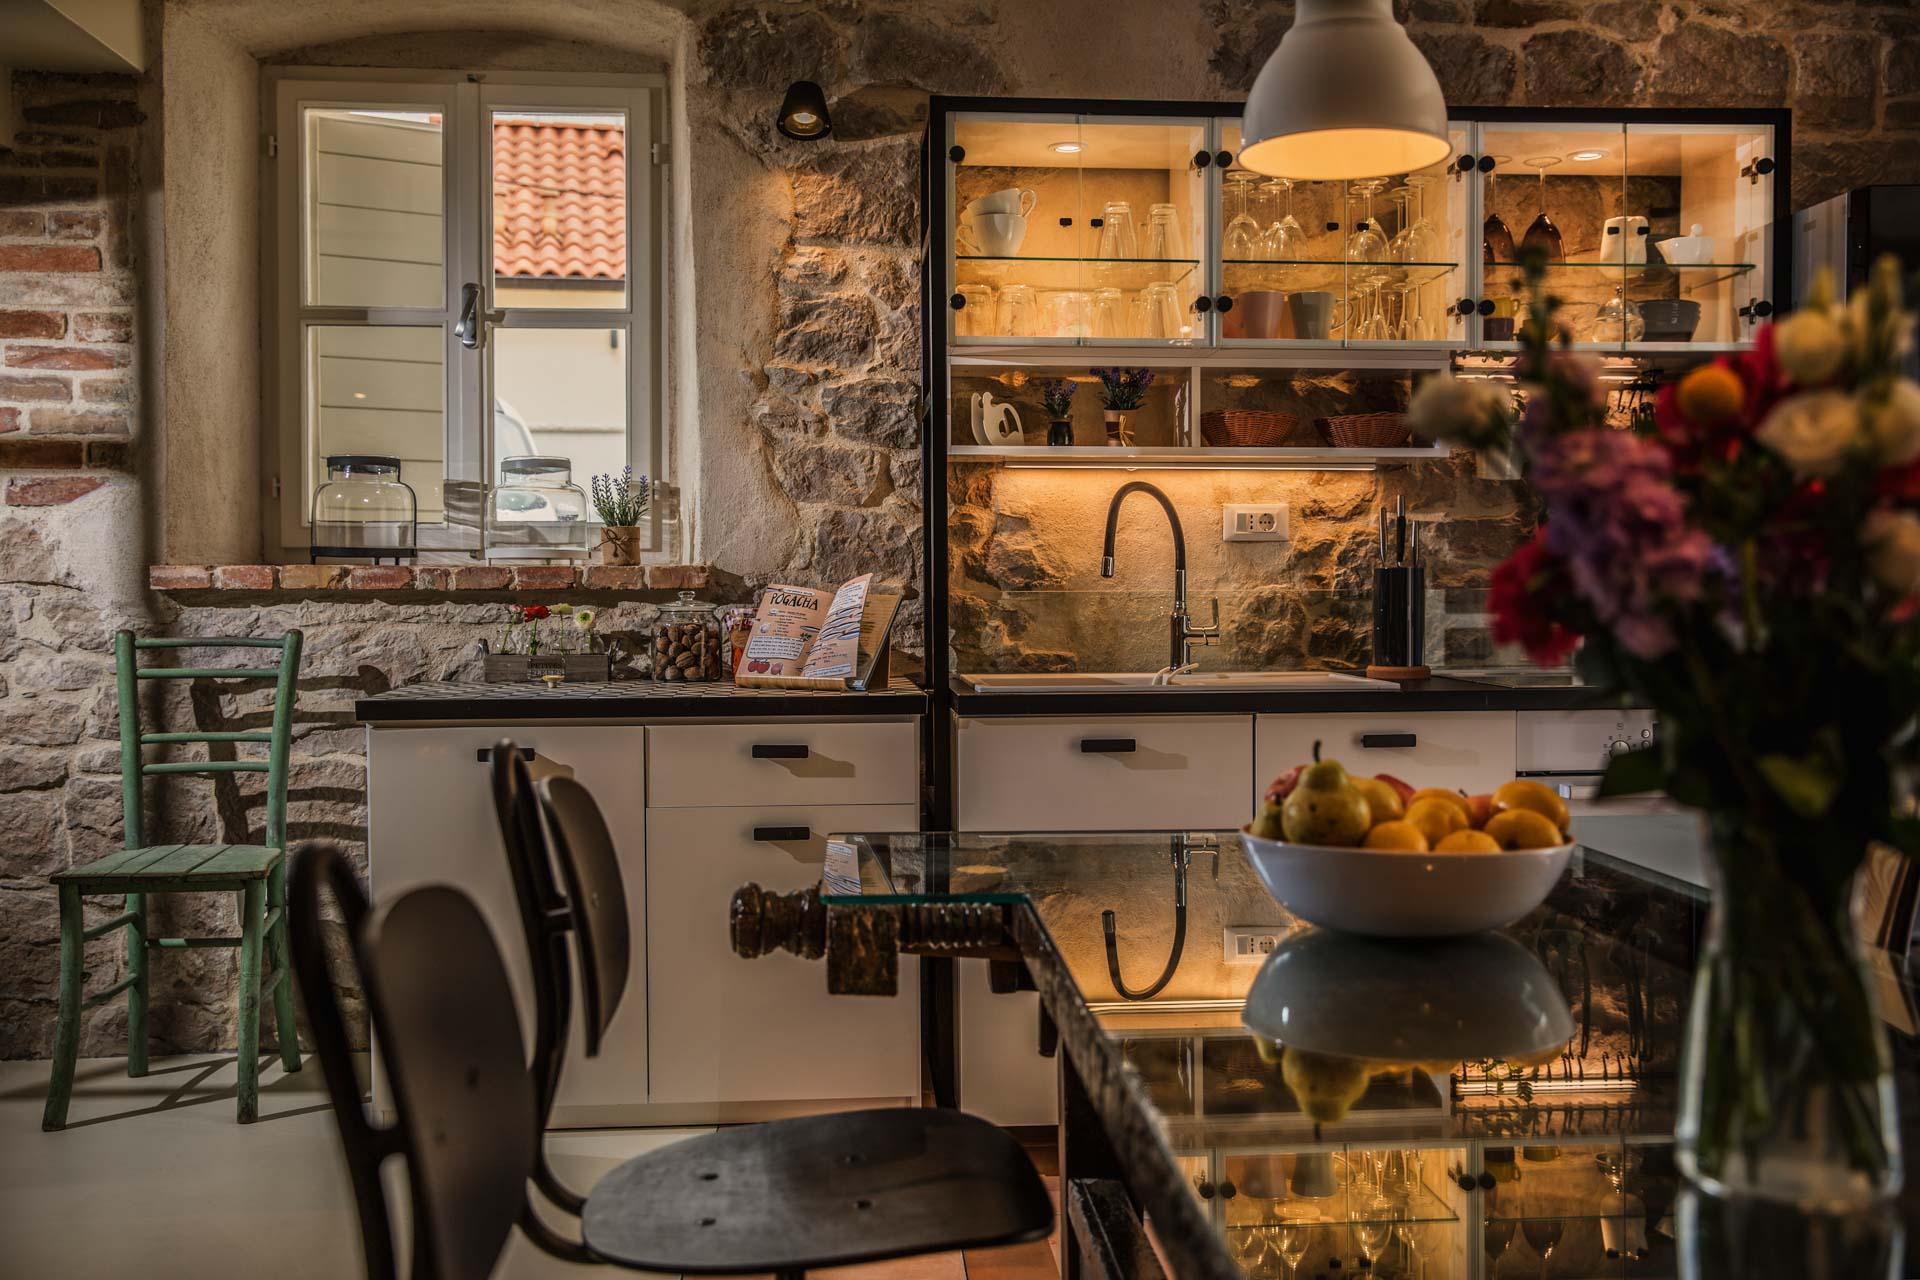 Vila za odmor s bazenom, prelijepa vanjska kuhinja